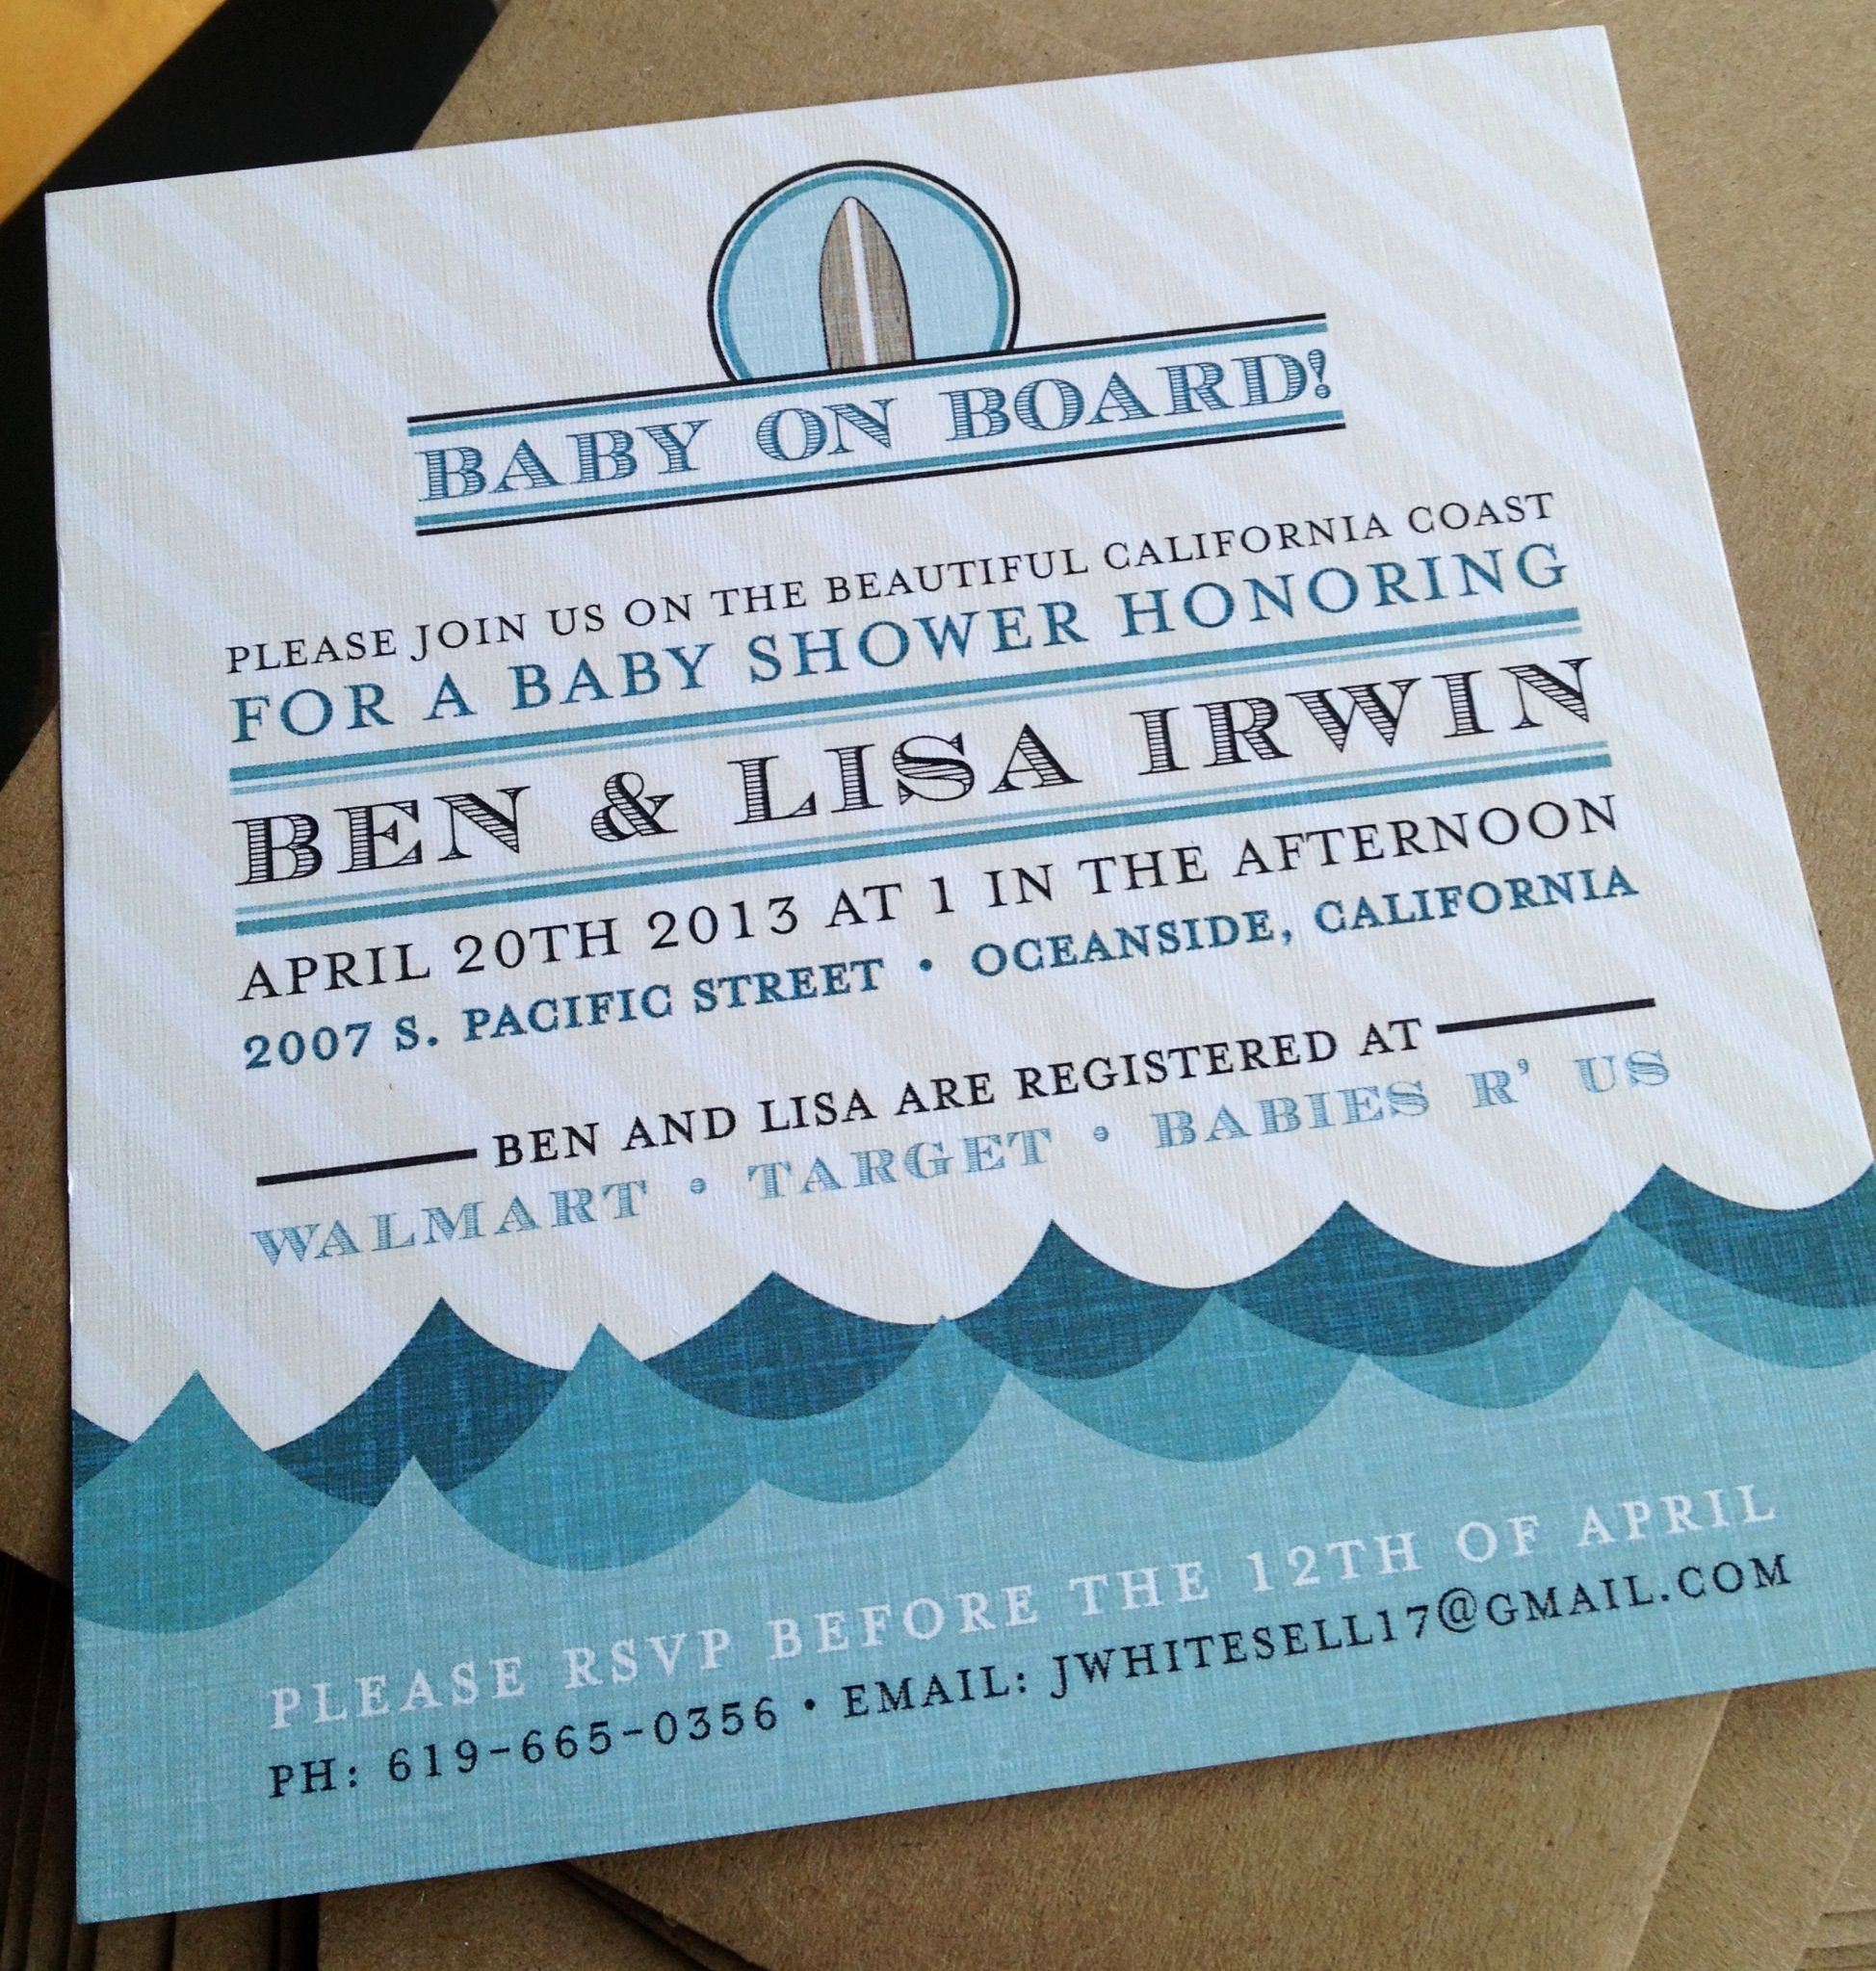 Paper Anchor Designs By Desiree Perez Irwin Baby Shower Invitation